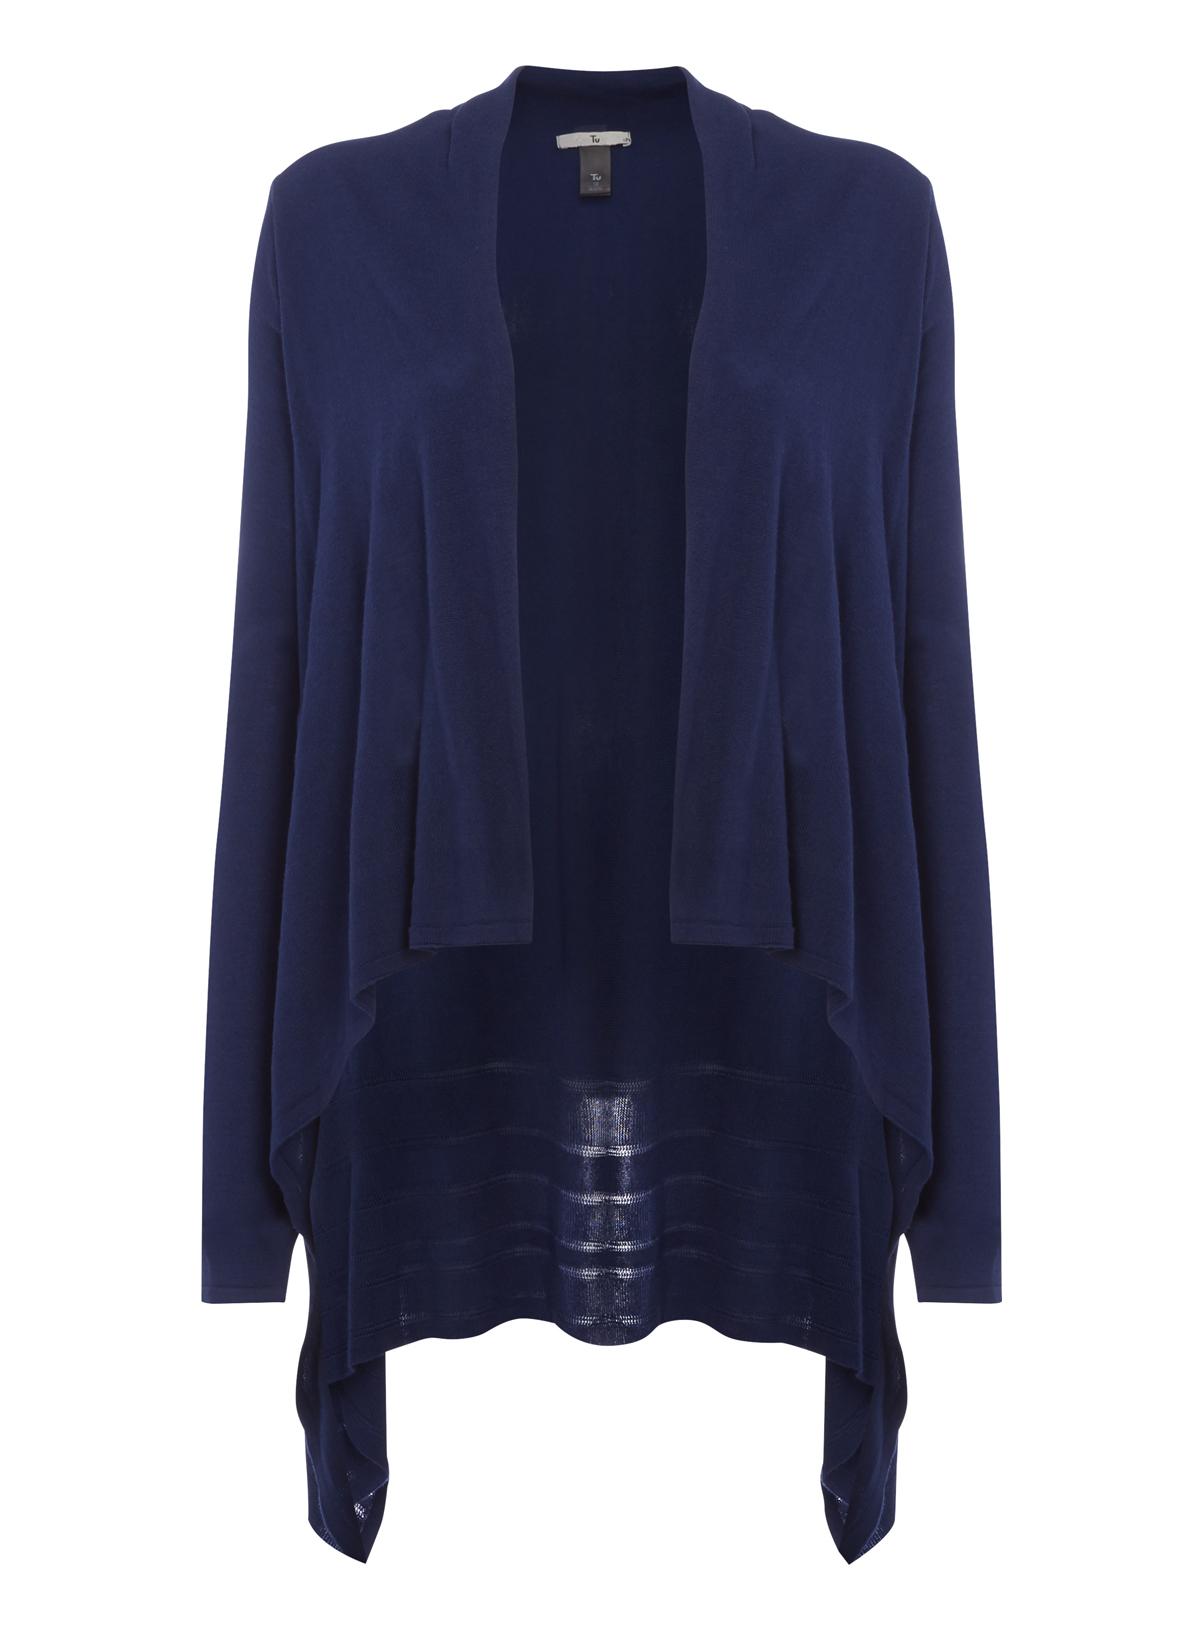 Womens Navy Waterfall Cardigan | Tu clothing